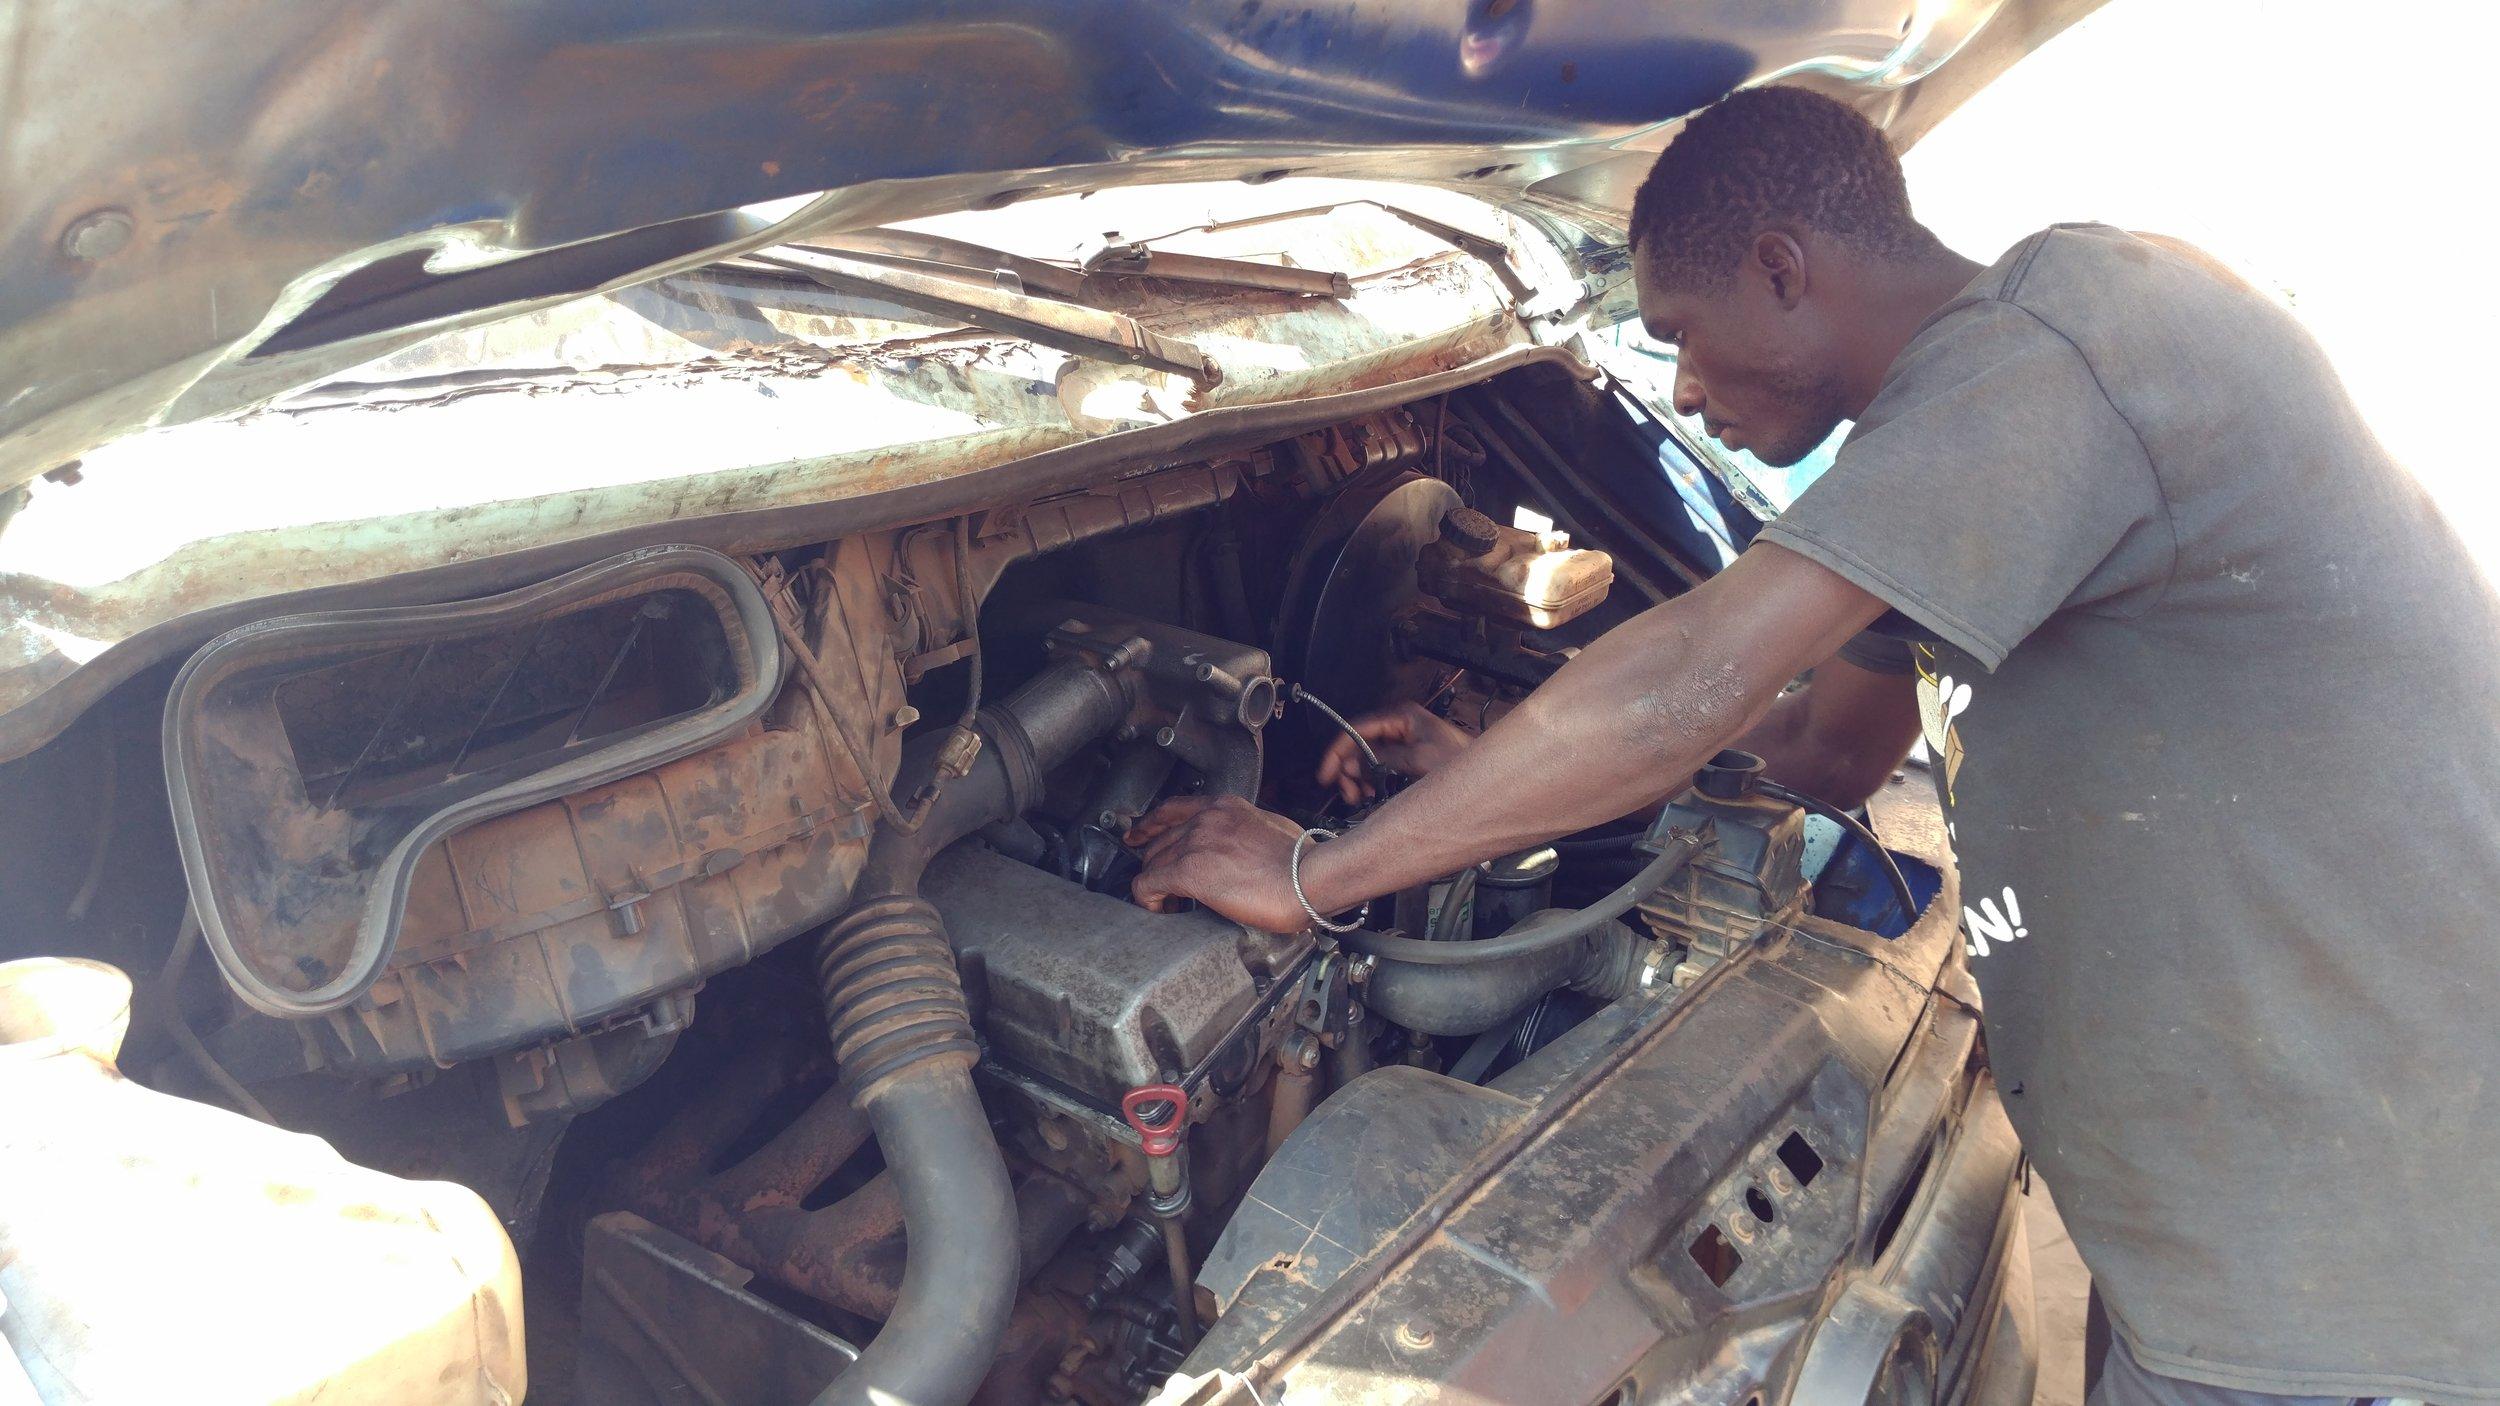 Bruno checking an engine